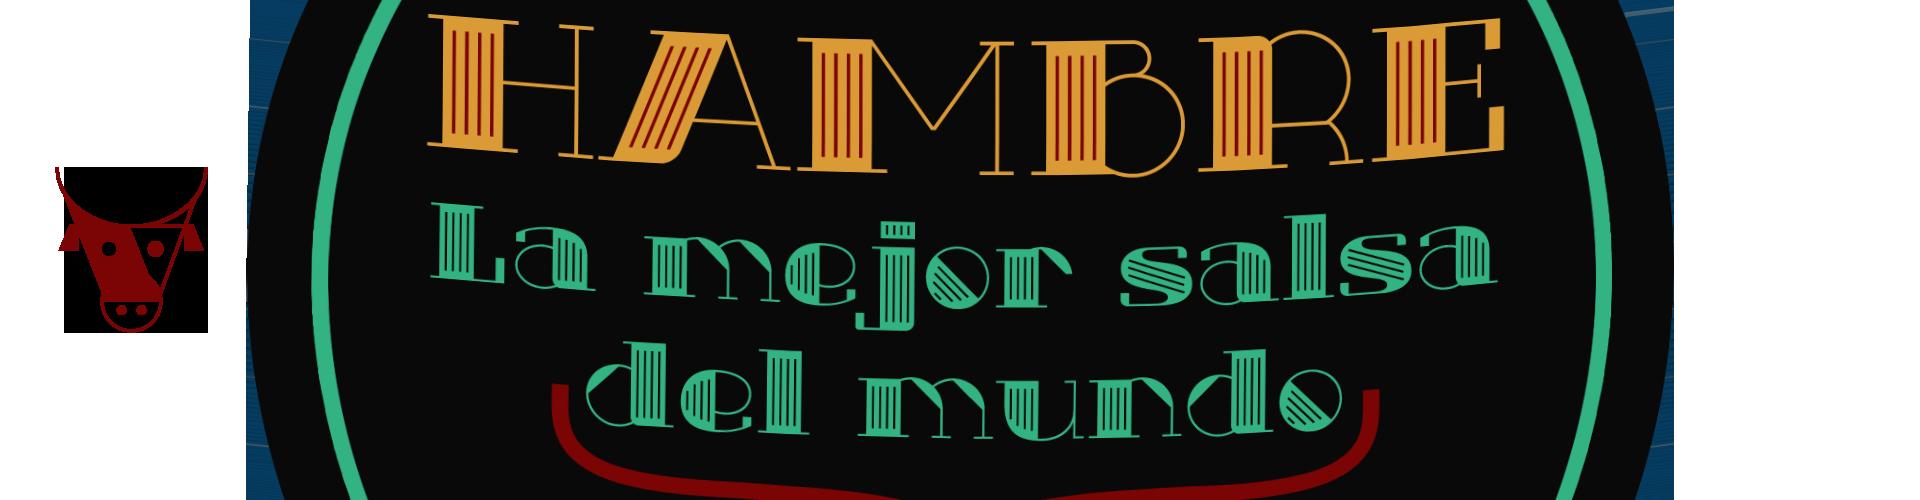 Txuleta Layered & Display Fonts